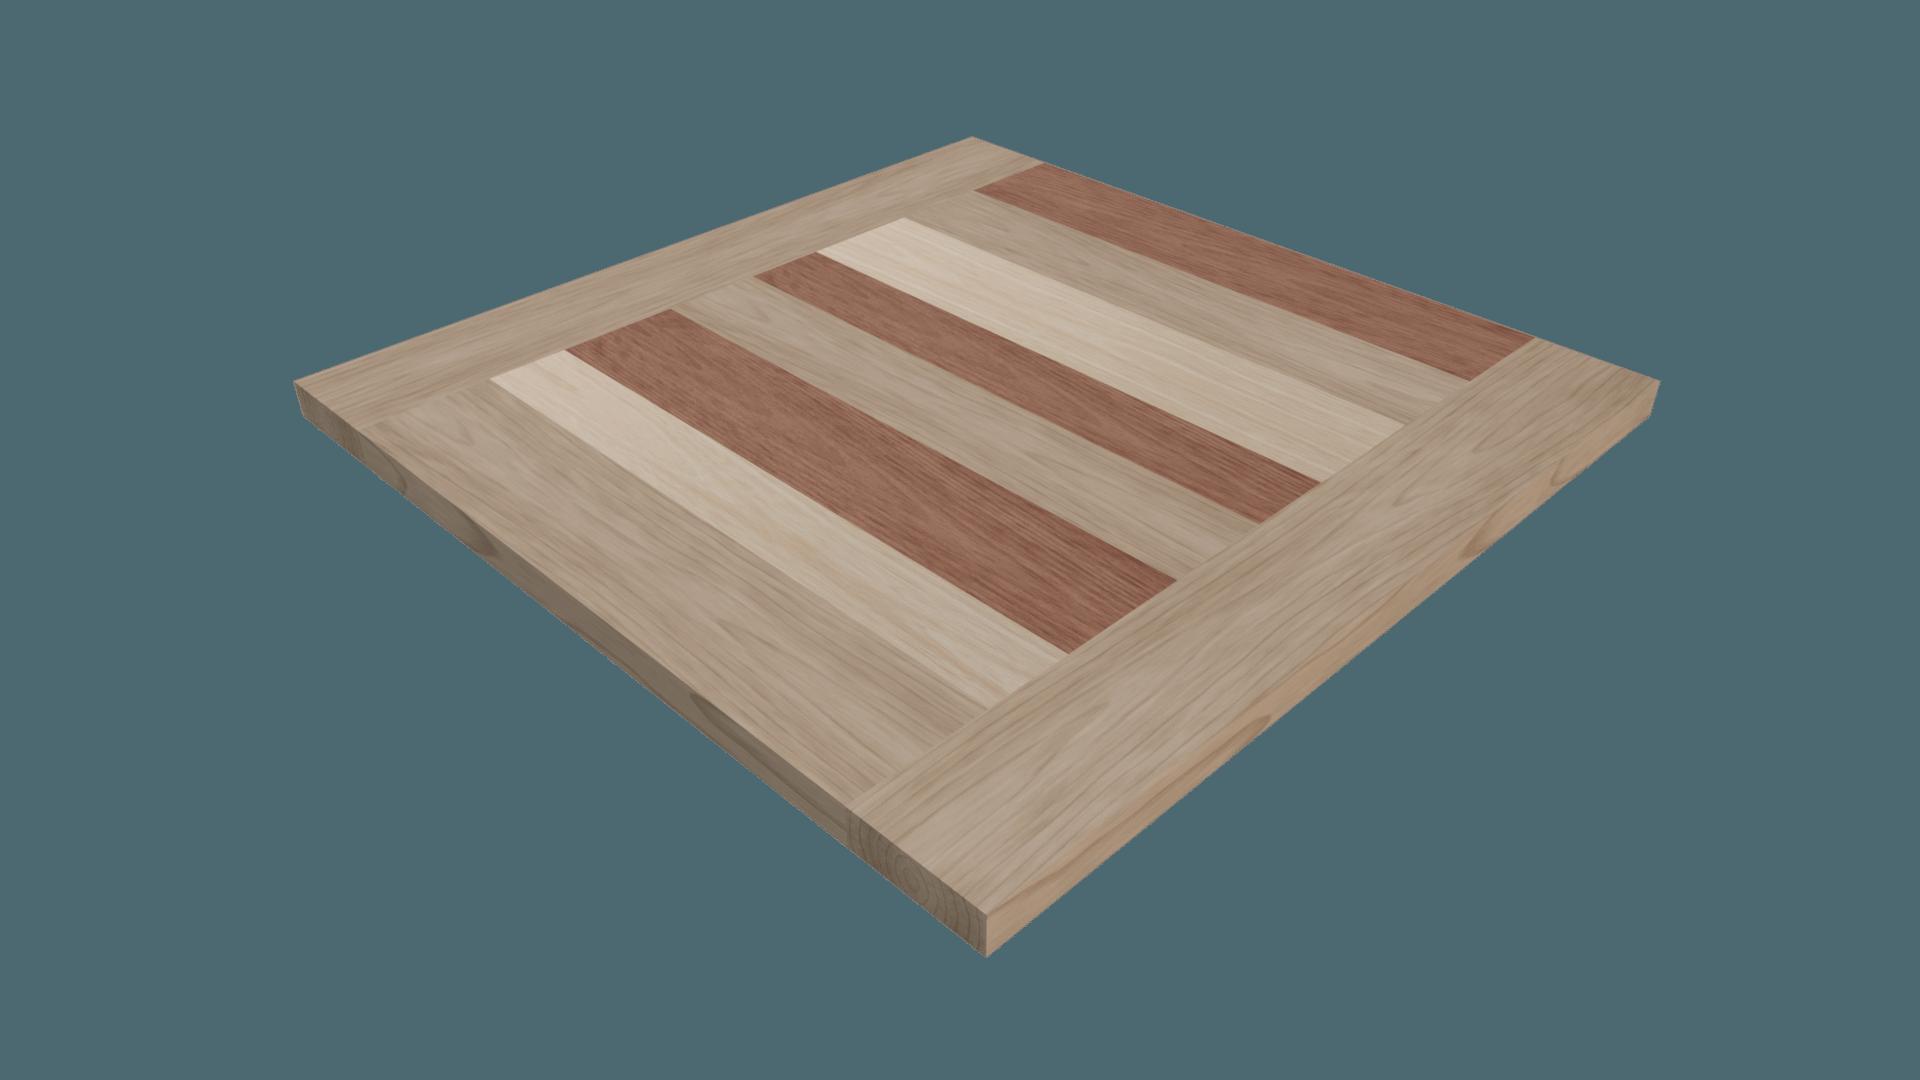 tables tops restaurant header top plymold edge table wood laminate